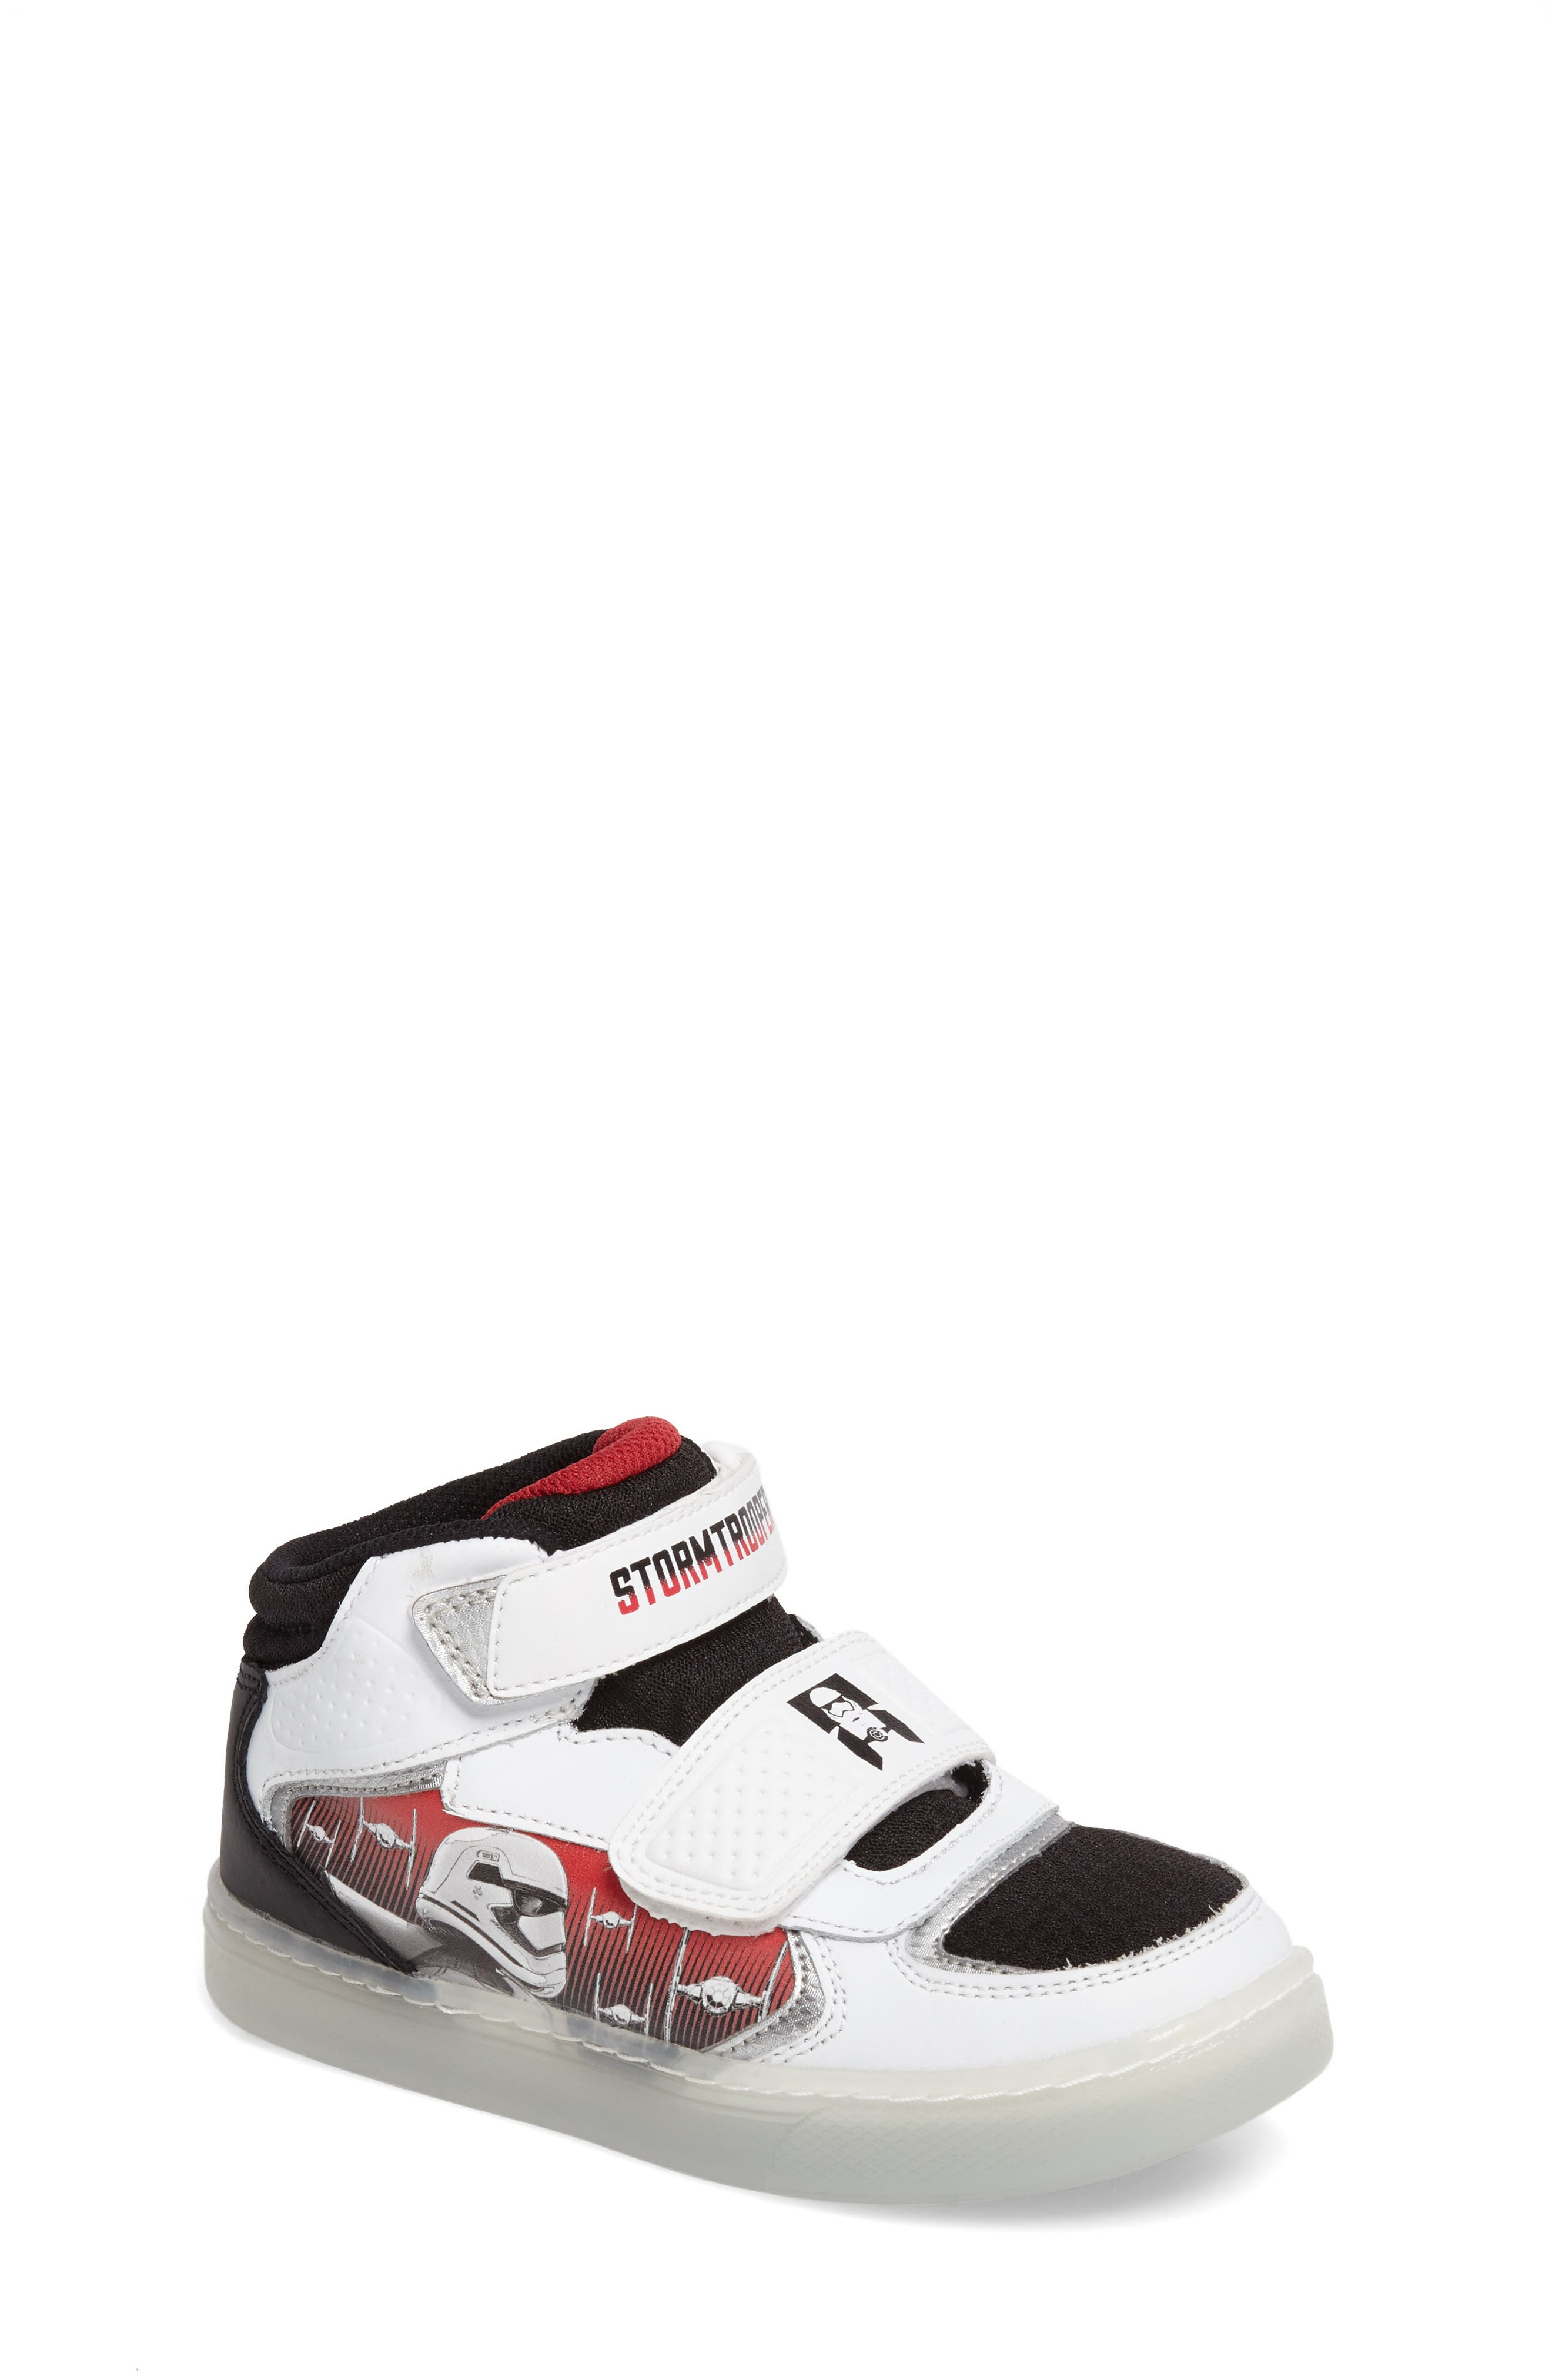 Stride Rite Star Wars® Stormtropper Galaxy Light-Up Sneaker (Toddler & Little Kid)